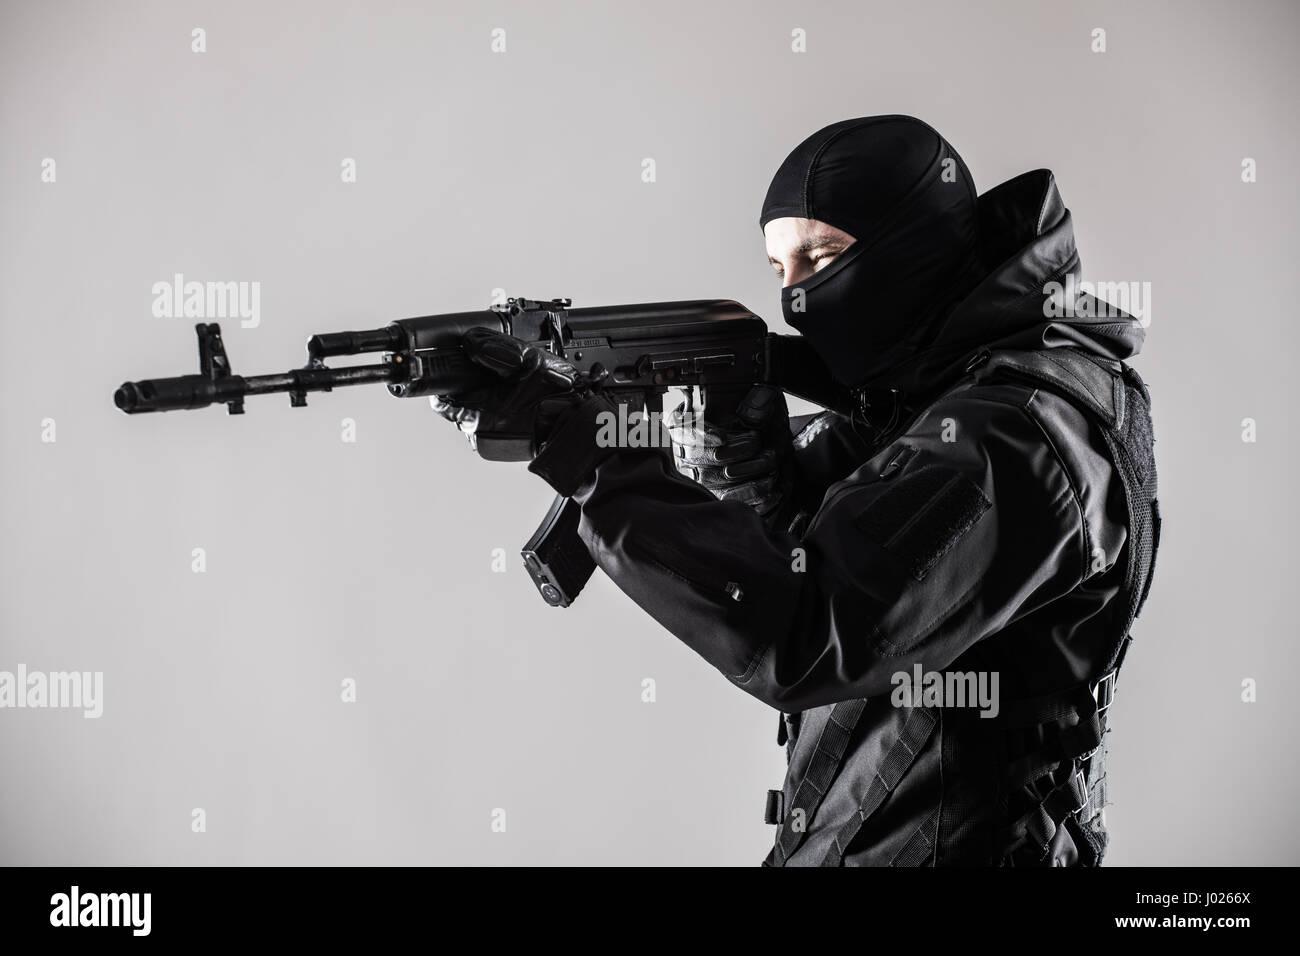 Terrorist aim with gun on isolated grey background - Stock Image